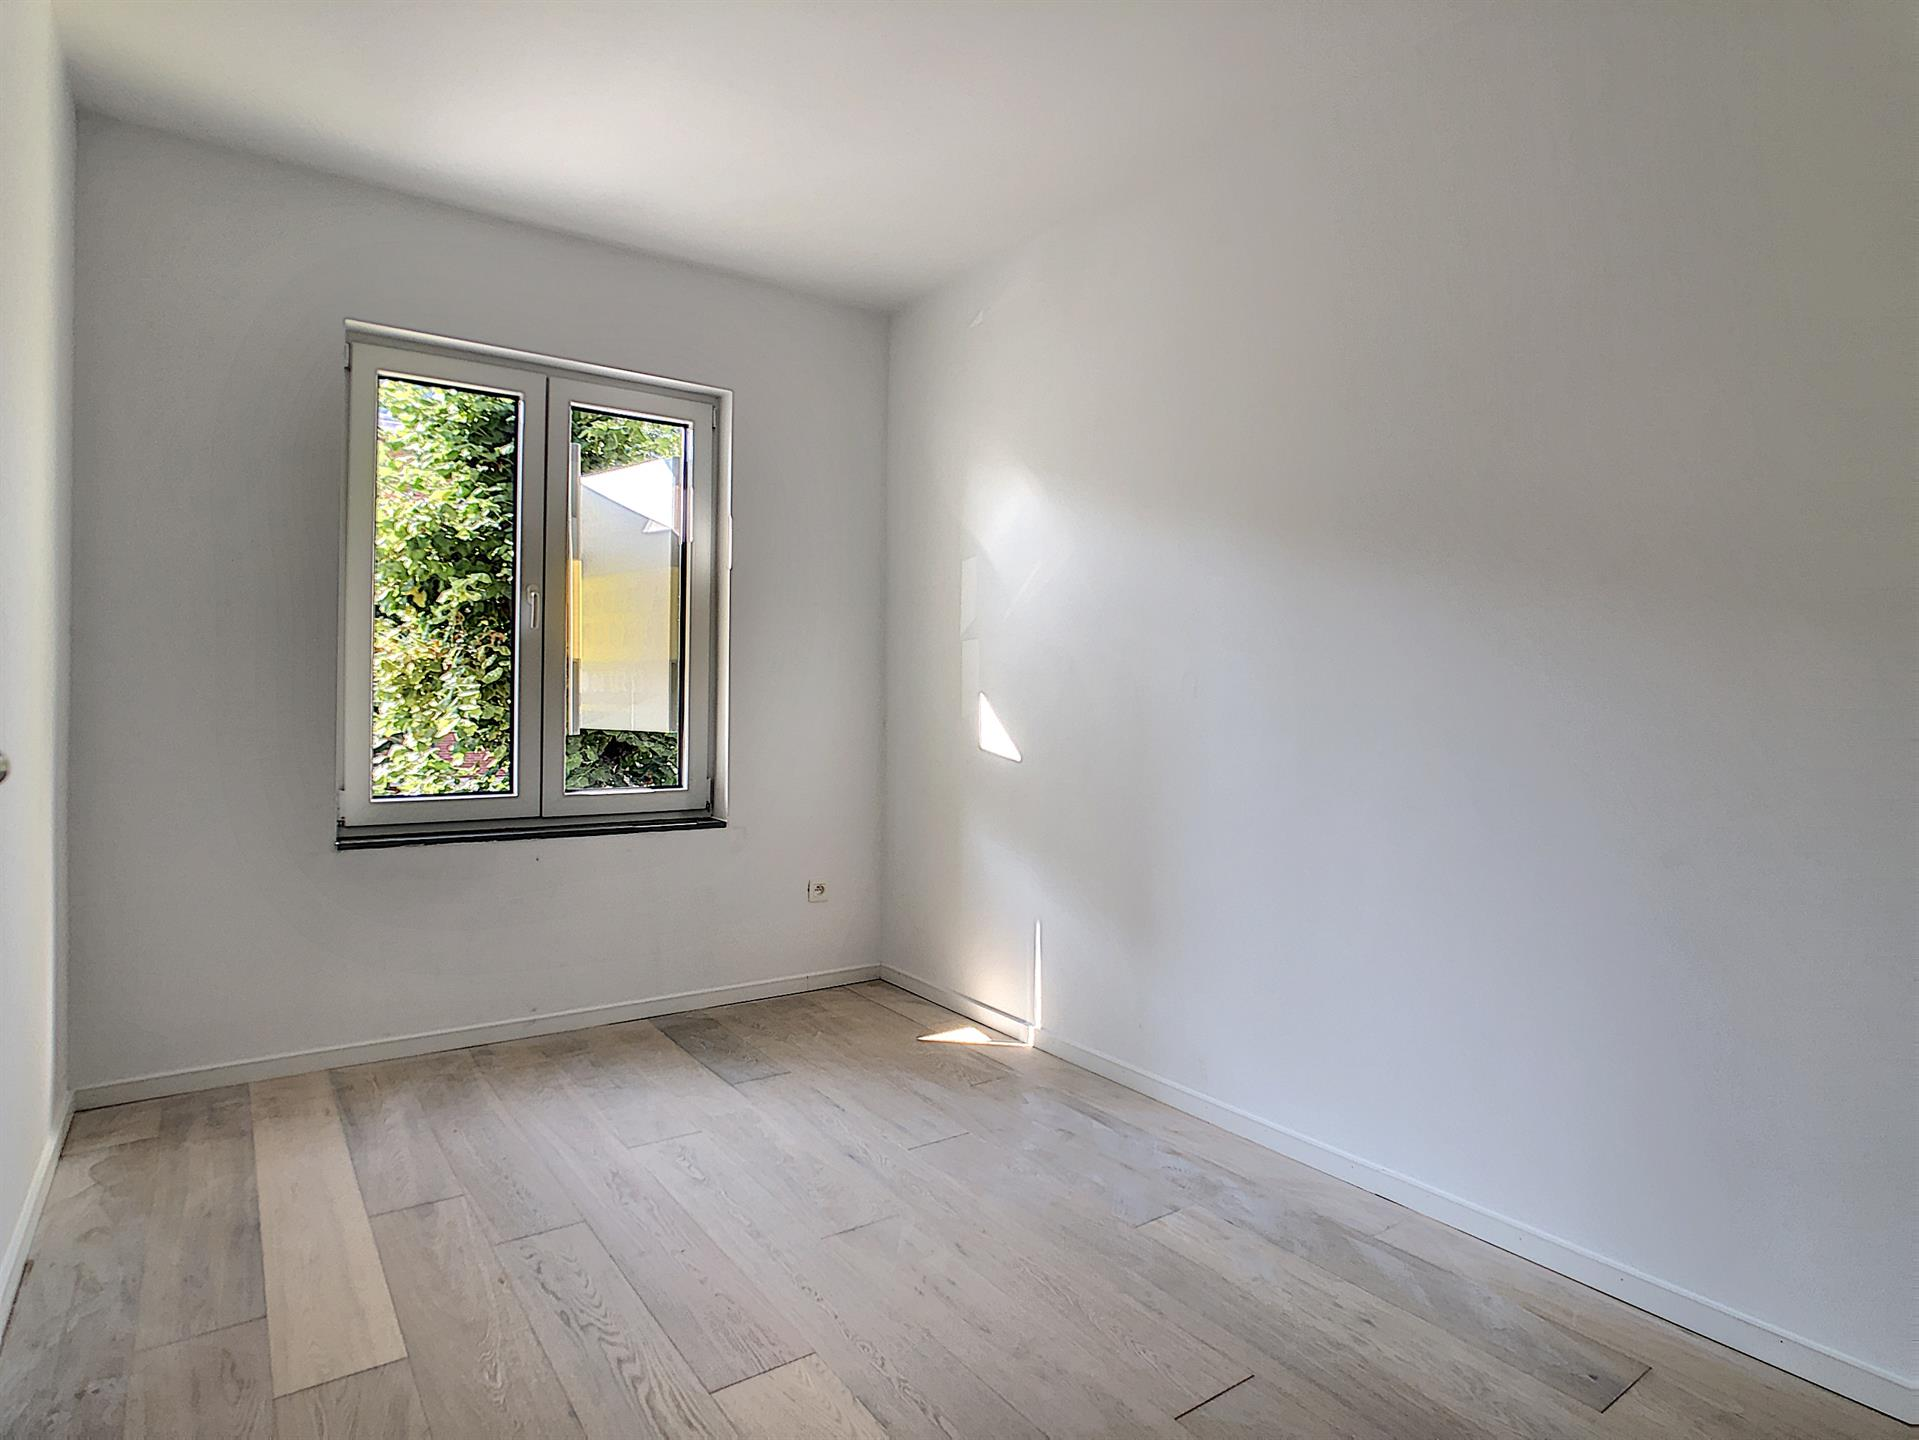 Appartement - Anderlecht - #4252388-11